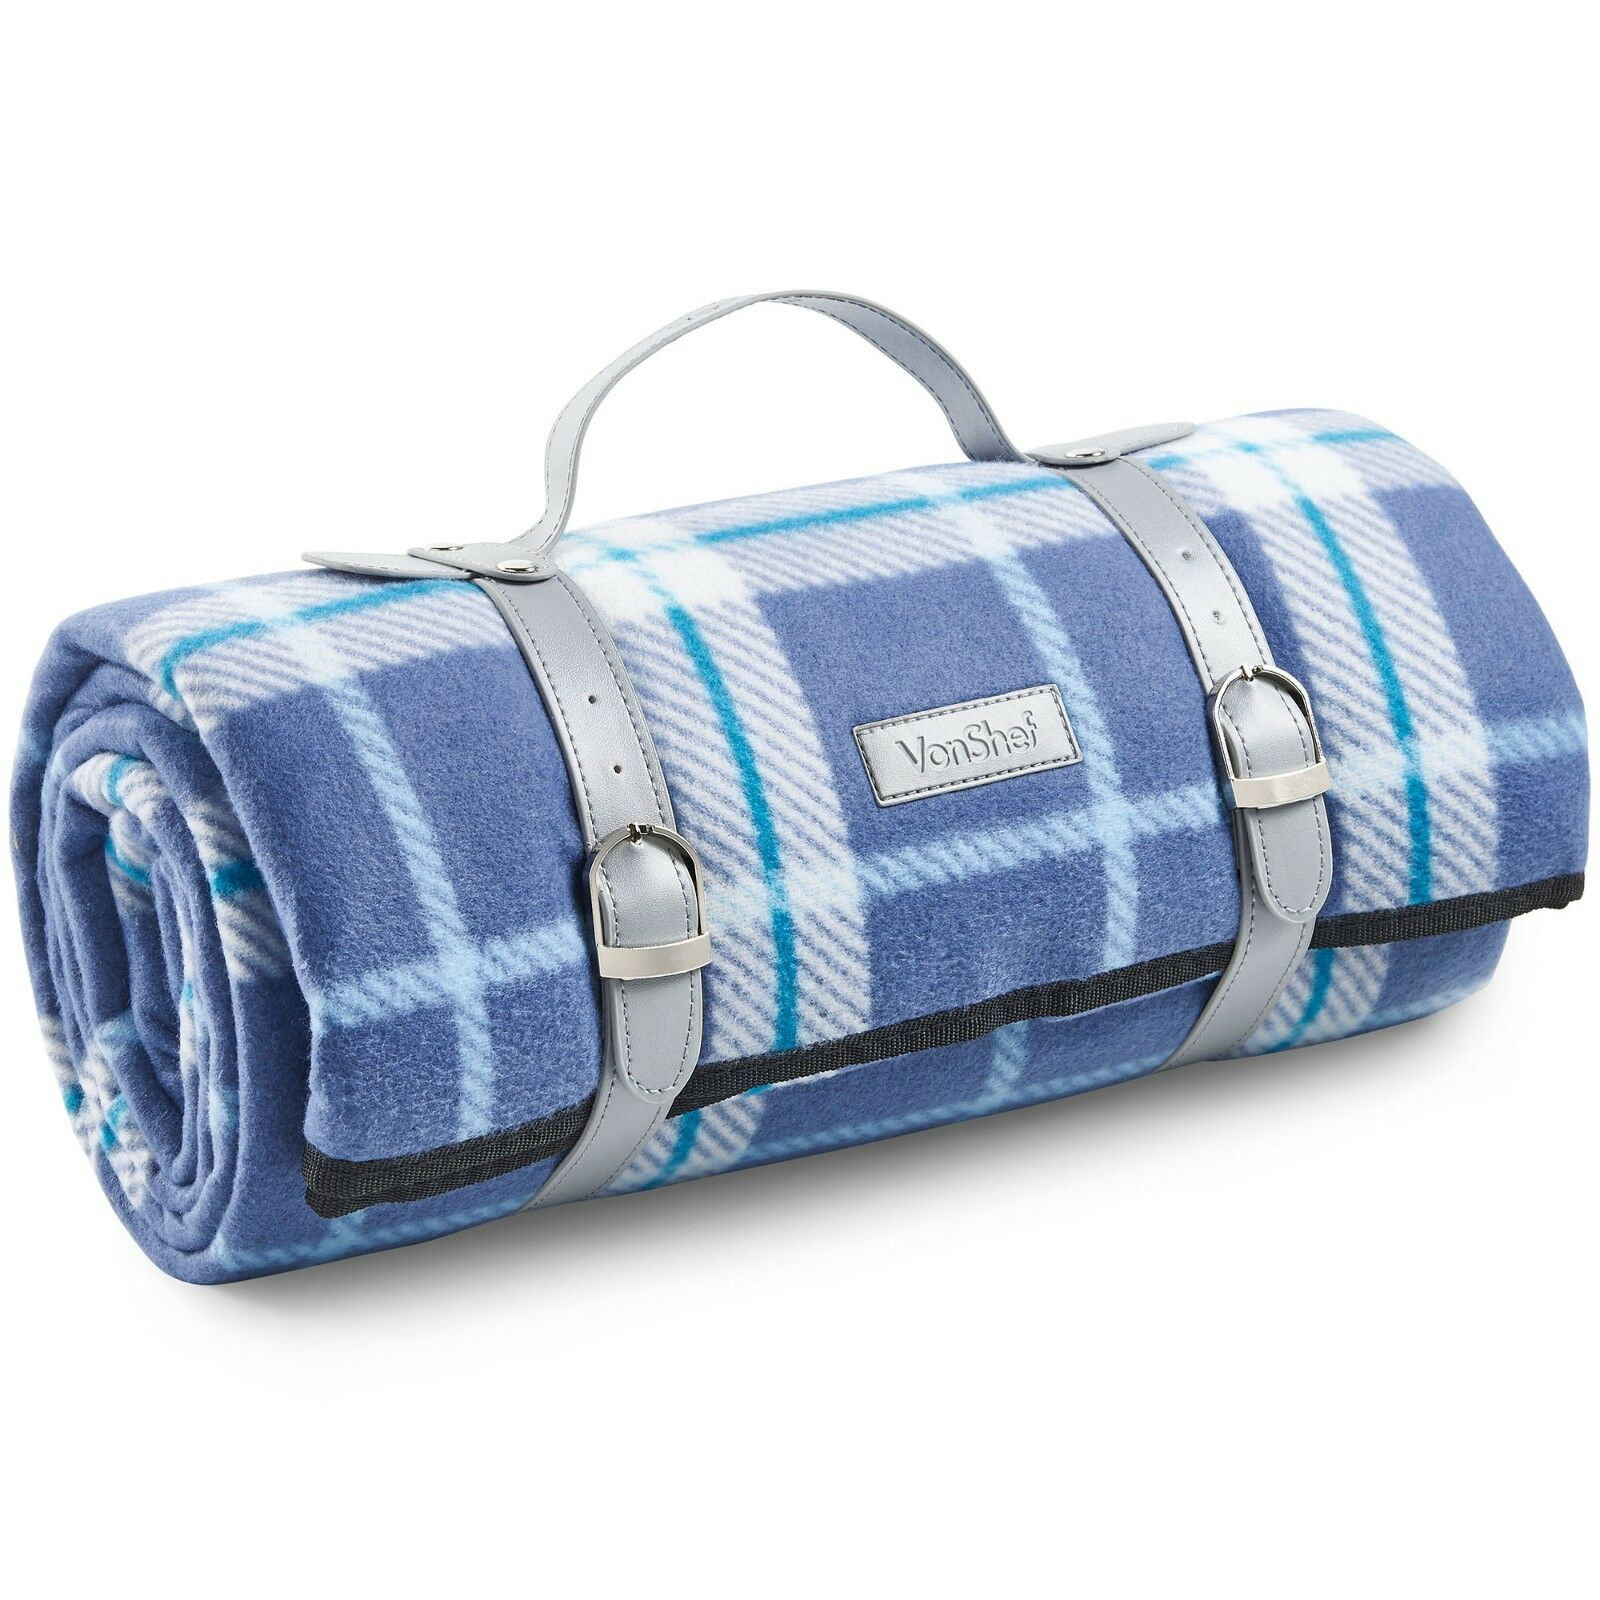 VonShef Picnic Blanket Mat Waterproof for Outdoor Picnics Be